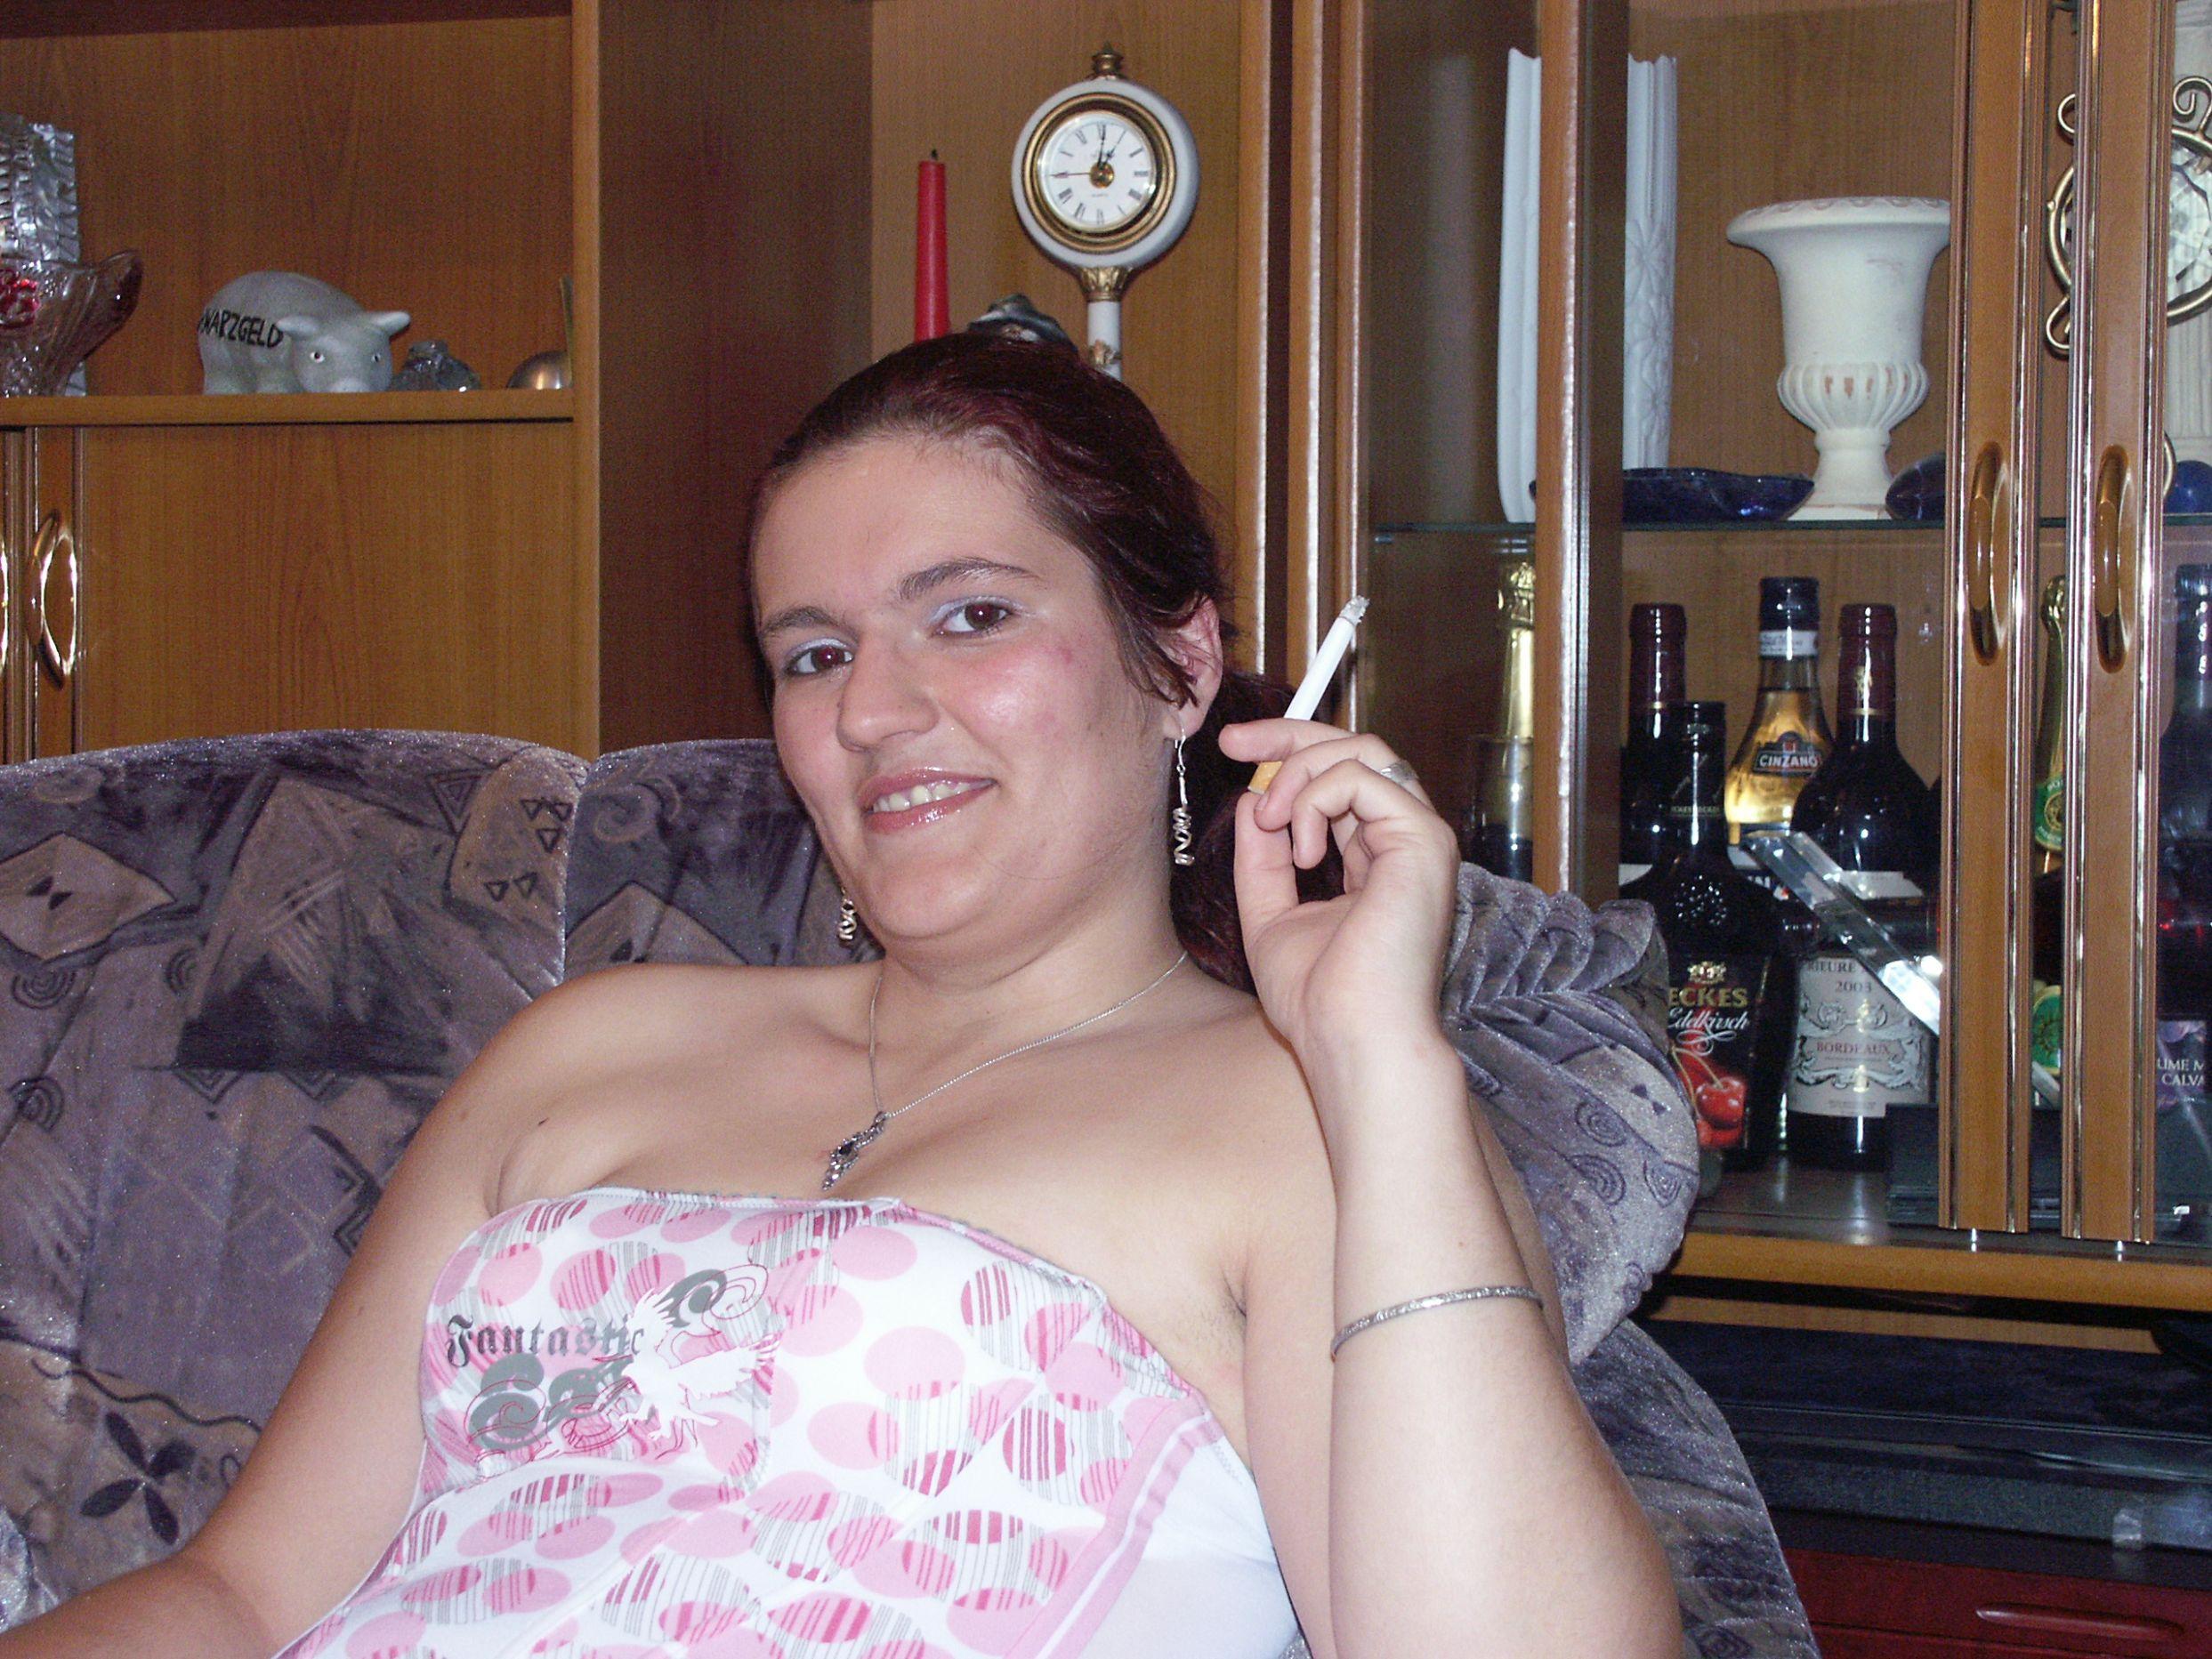 Martina, 26, Bonn